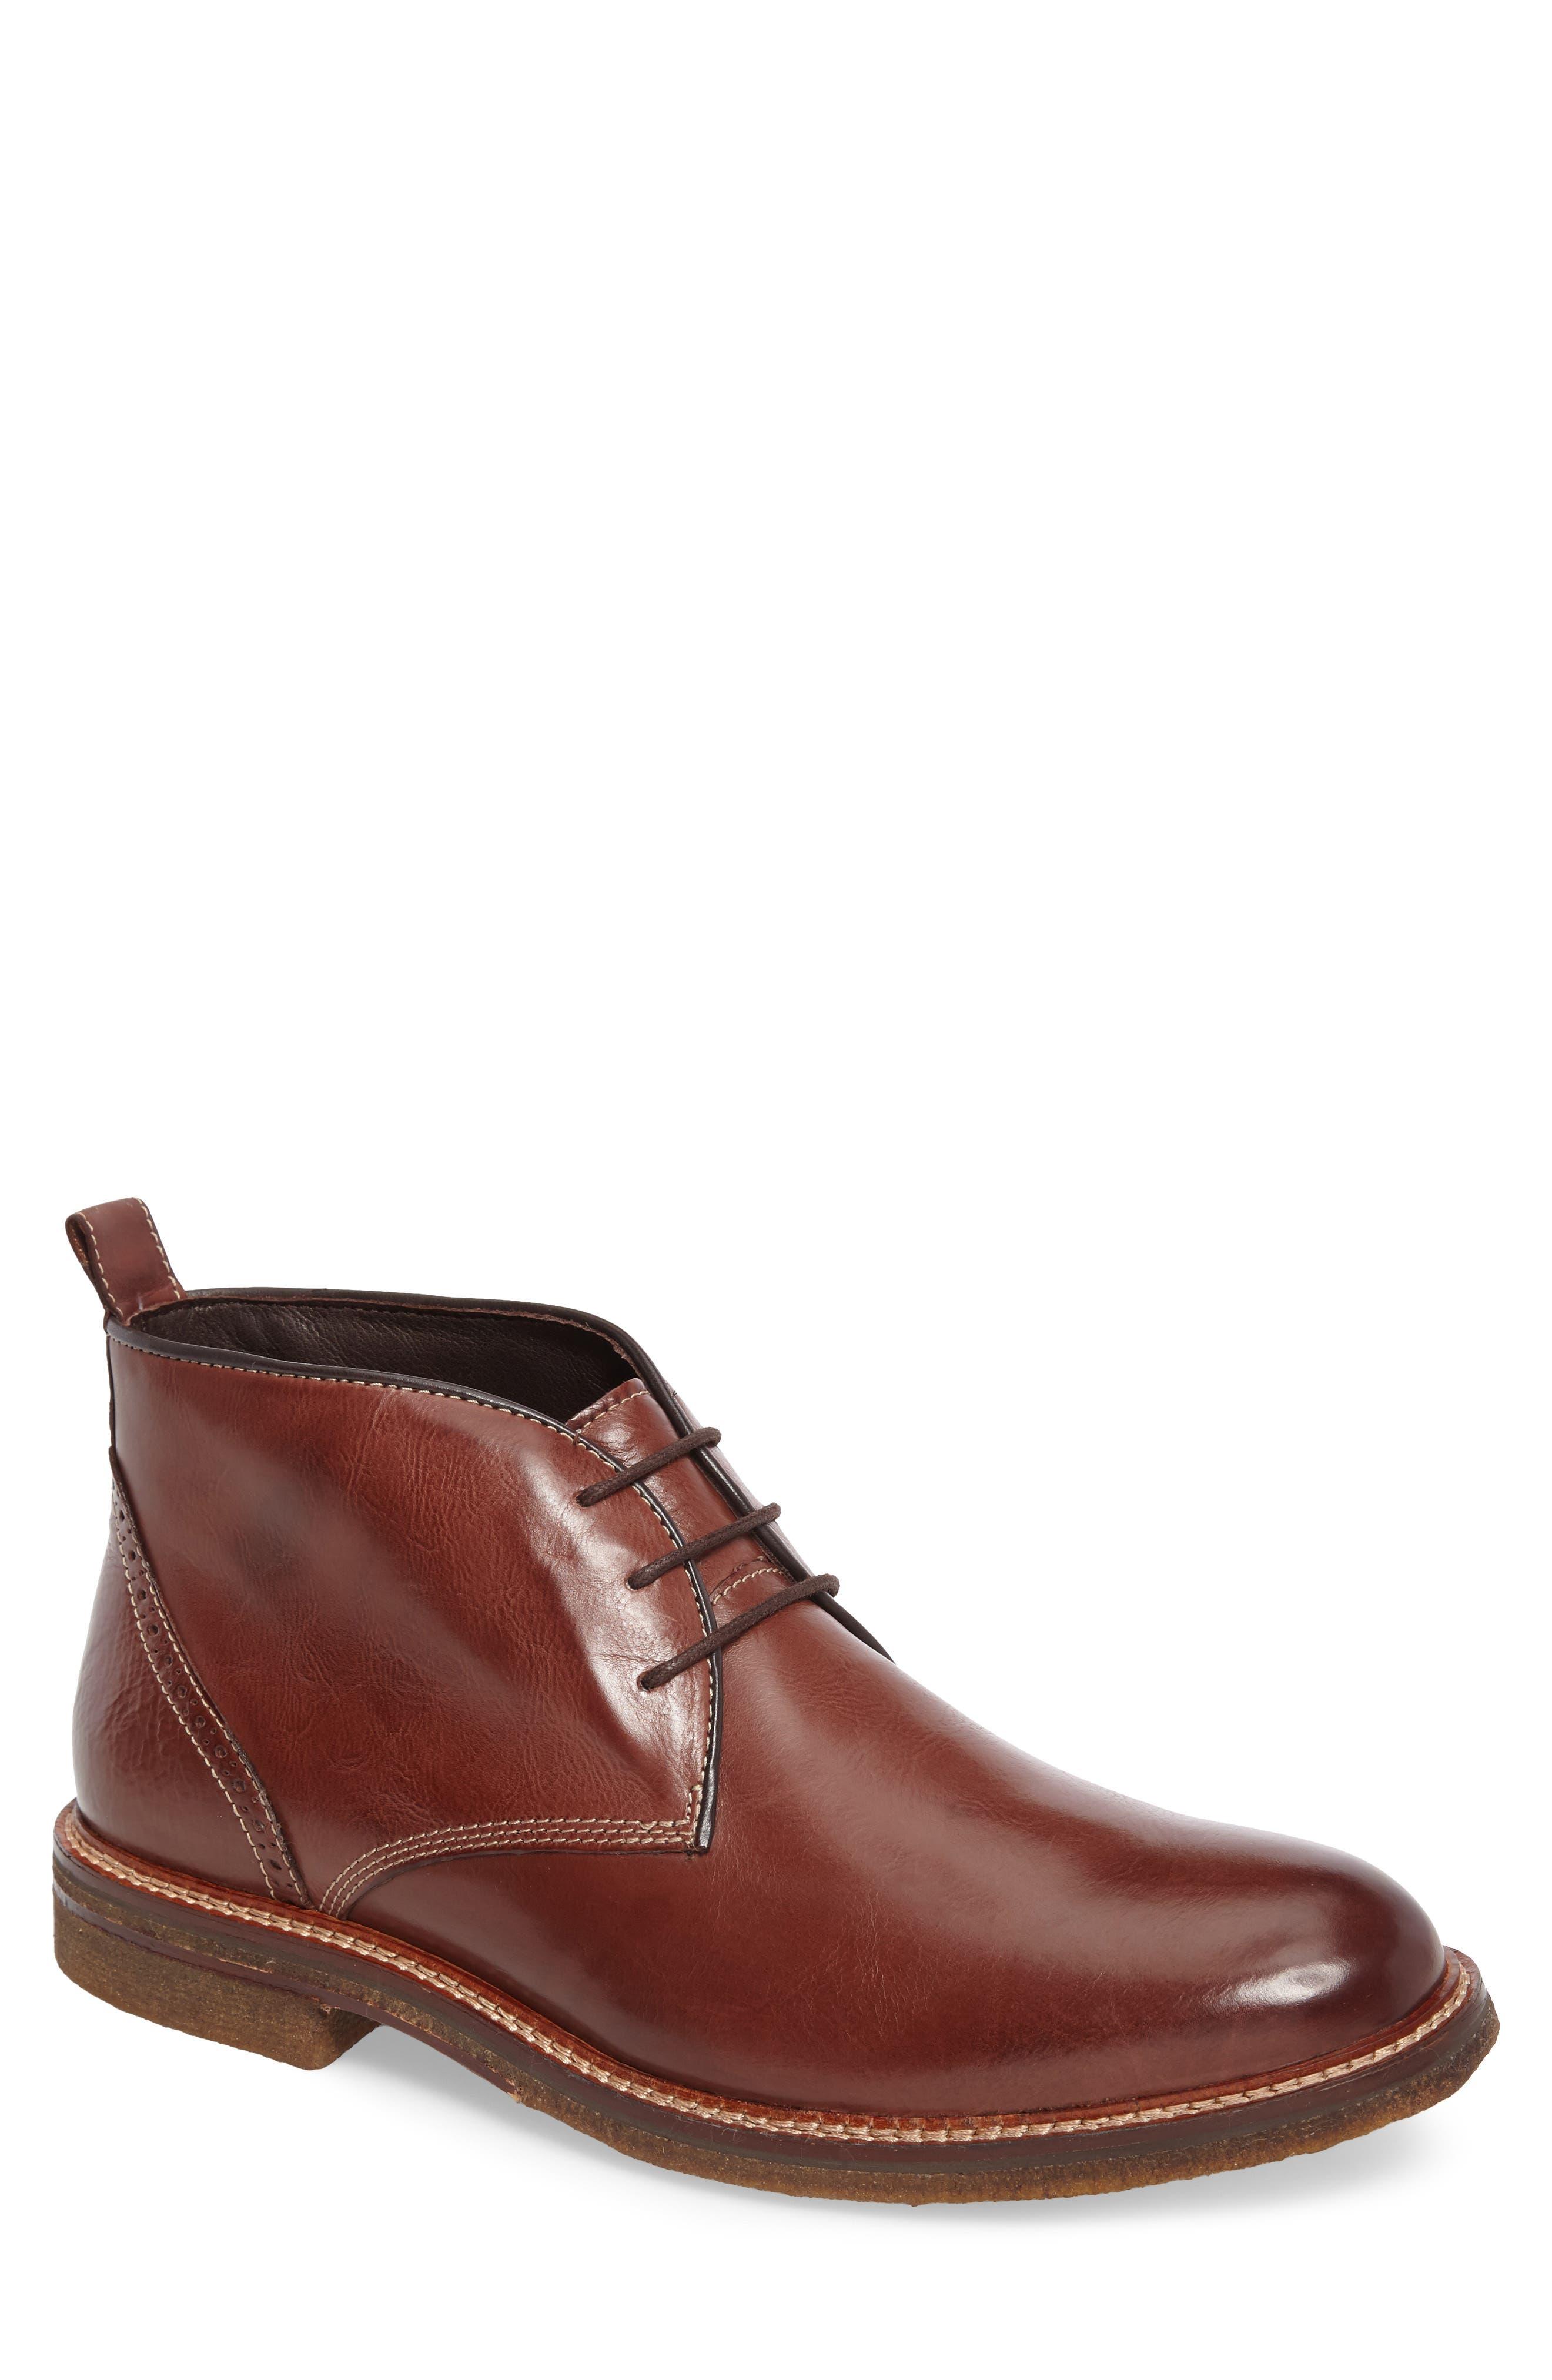 J&M 1850 Forrester Chukka Boot